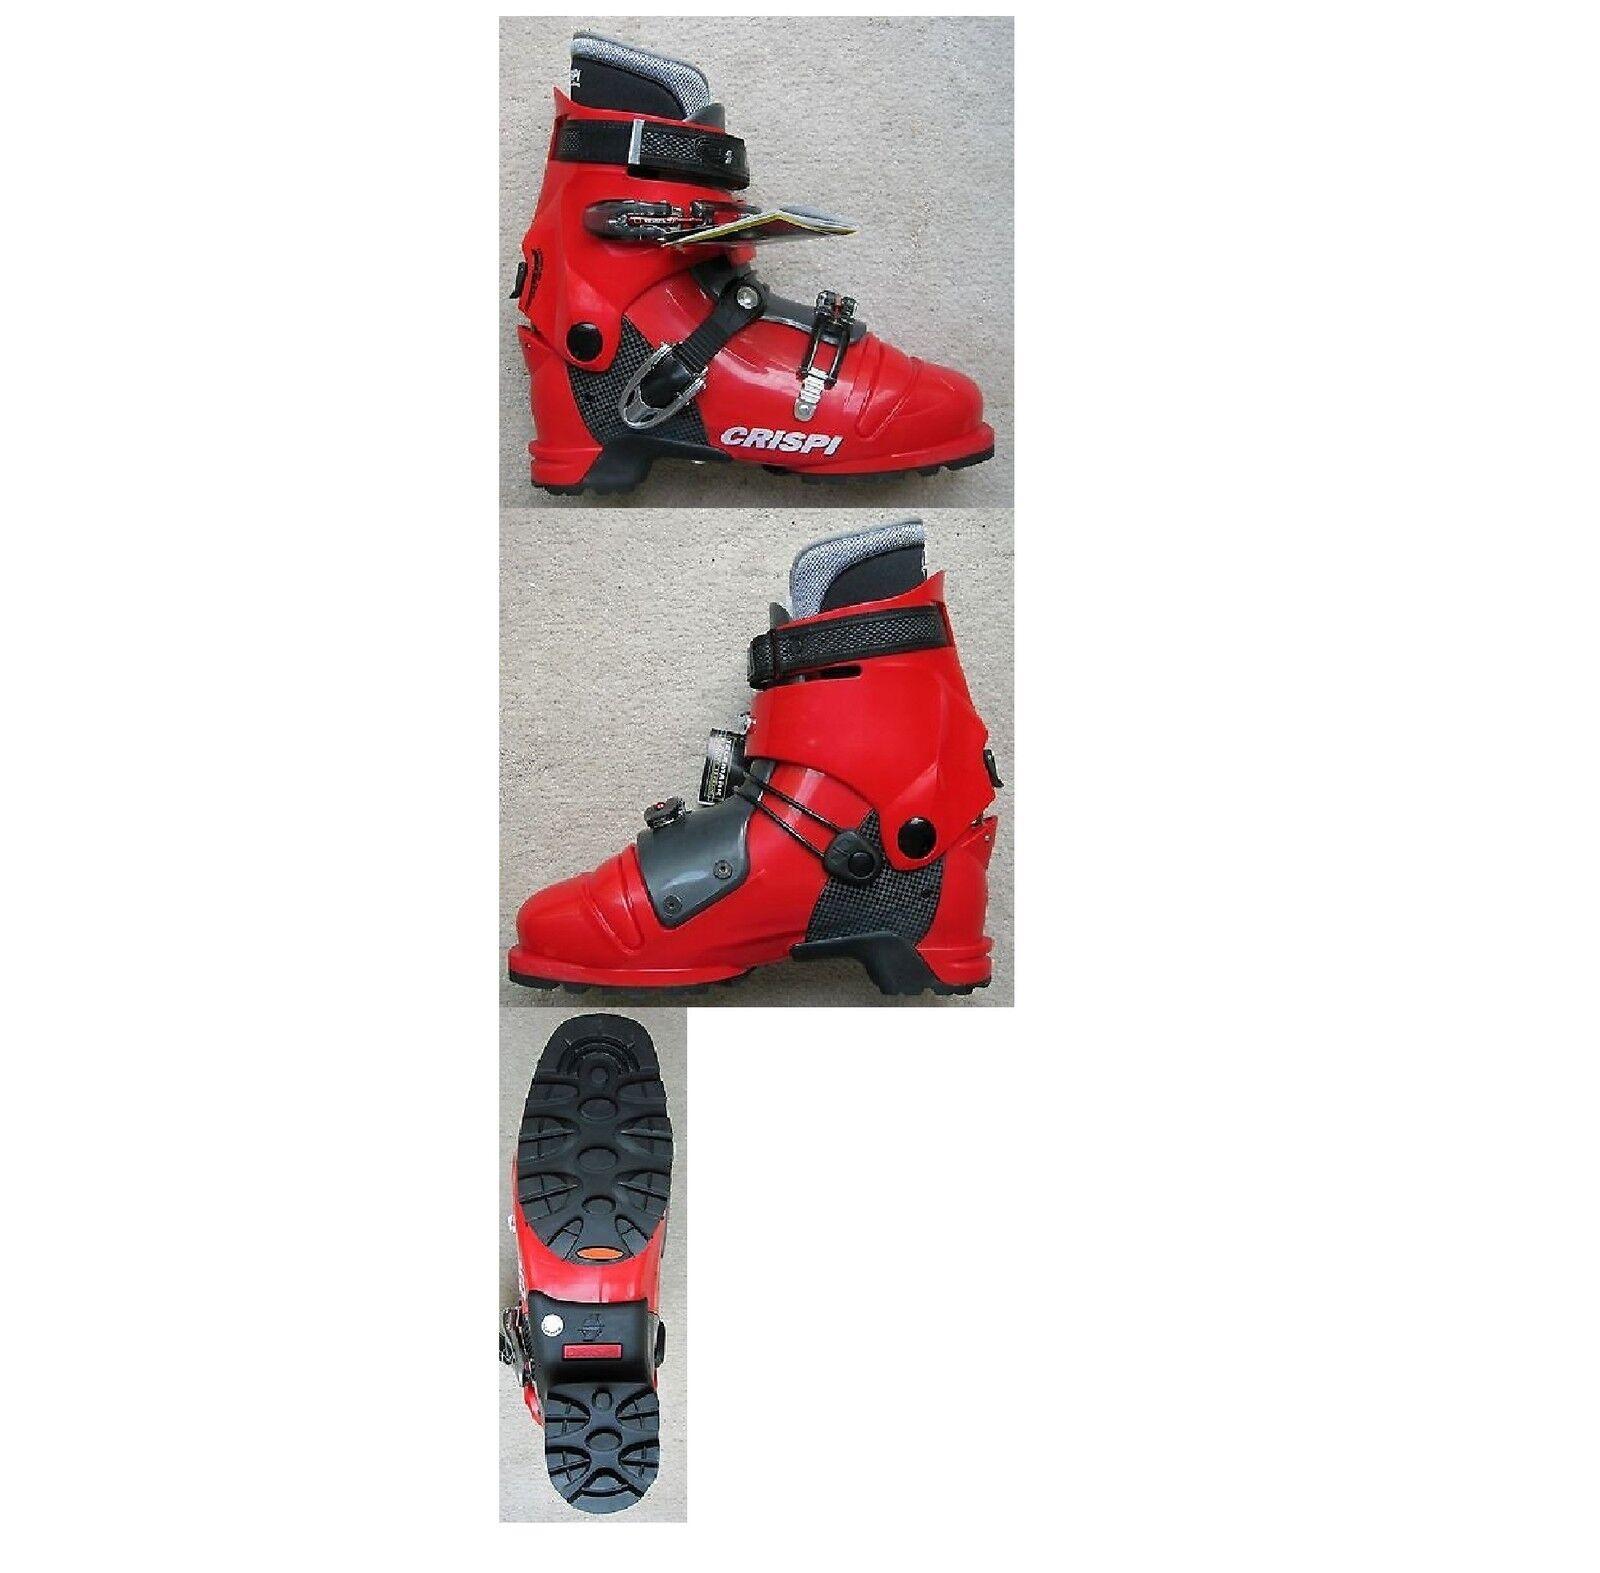 CRISPI CRISPI CRISPI DIABLO MS - Chaussures de Ski Randonnée *NEUF* 66bb0c